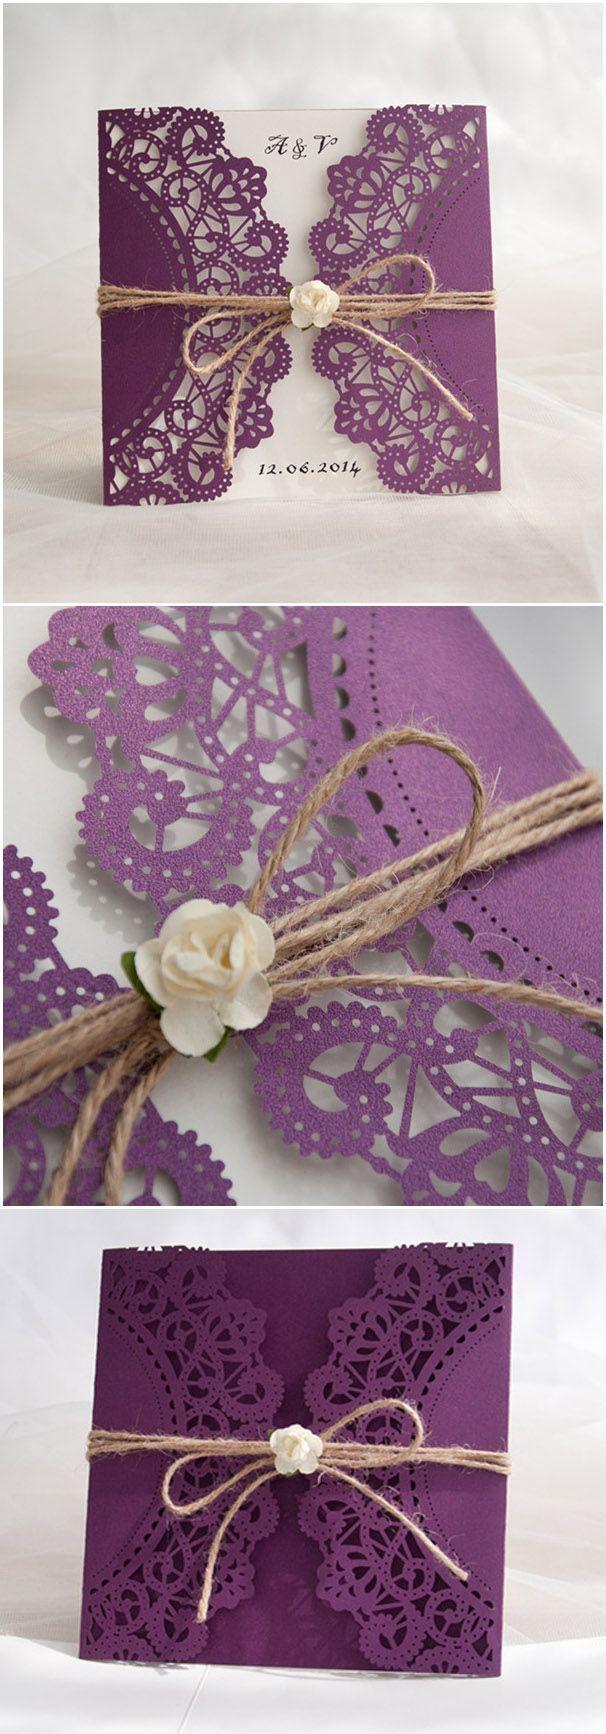 chic rustic purple laser cut wedding invitations for country wedding ideas: